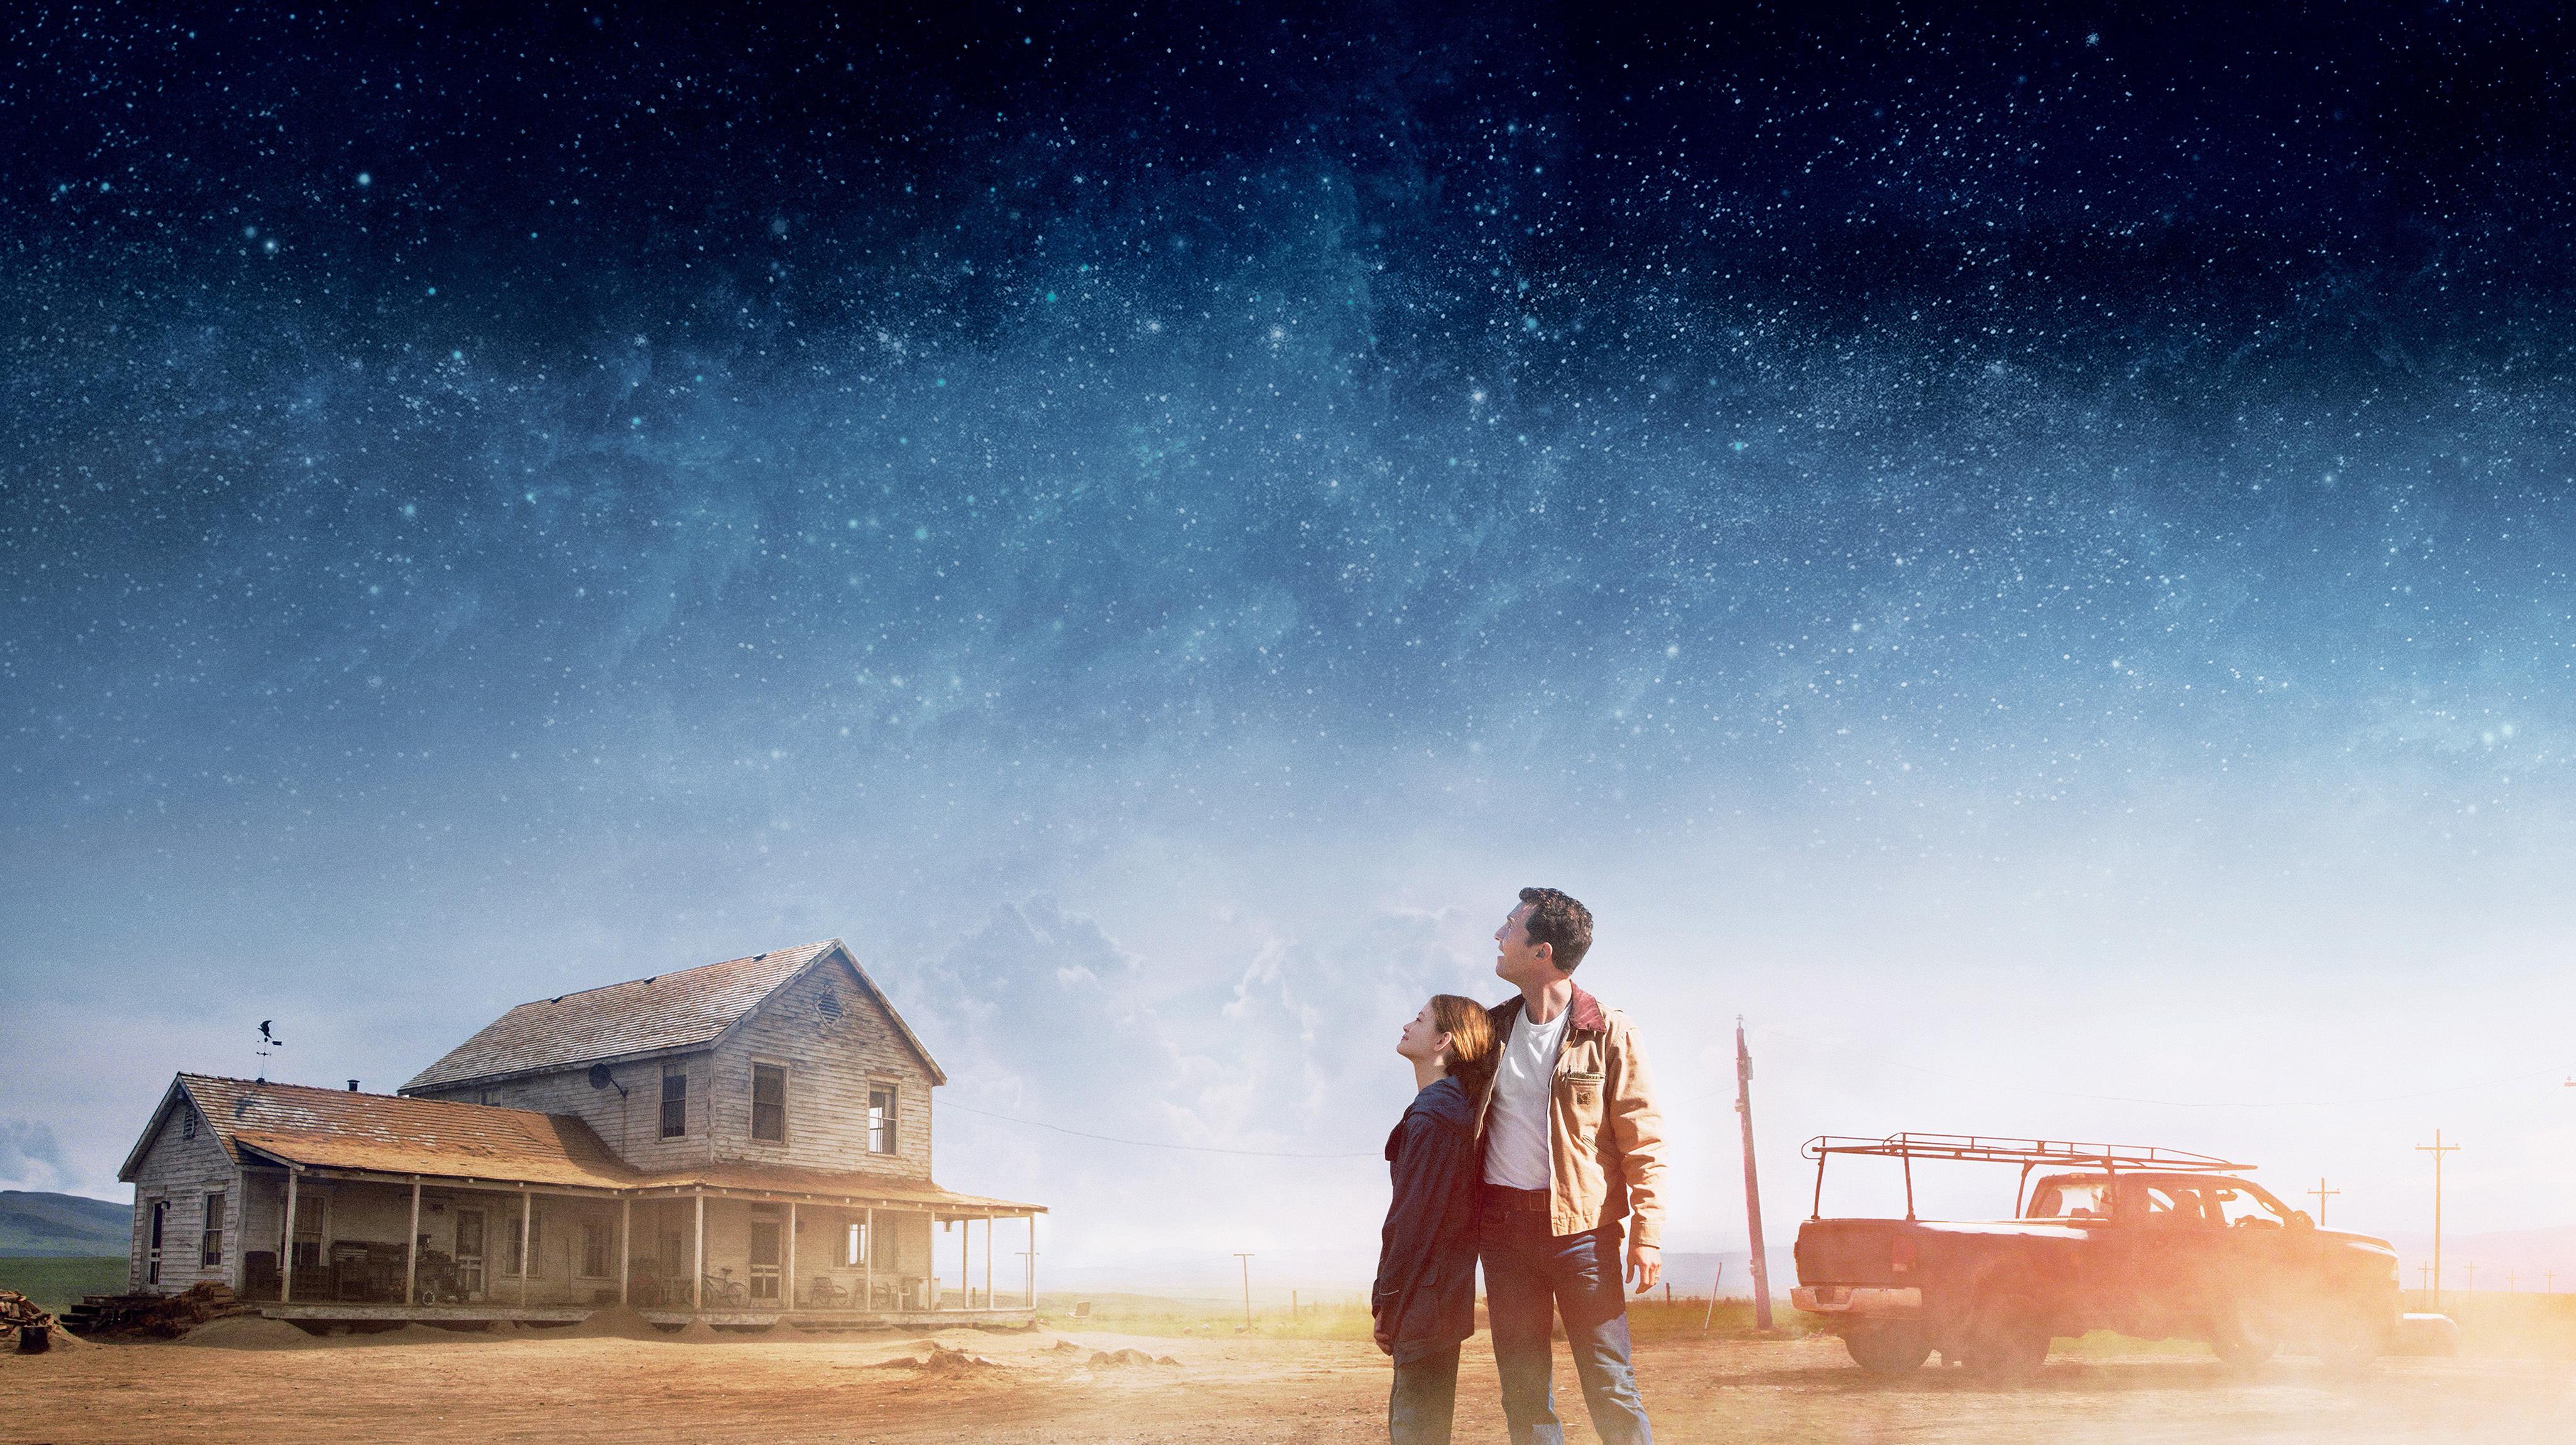 interstellar movie film 2014 year matthew mcconaughey wallpapers 4100x2300